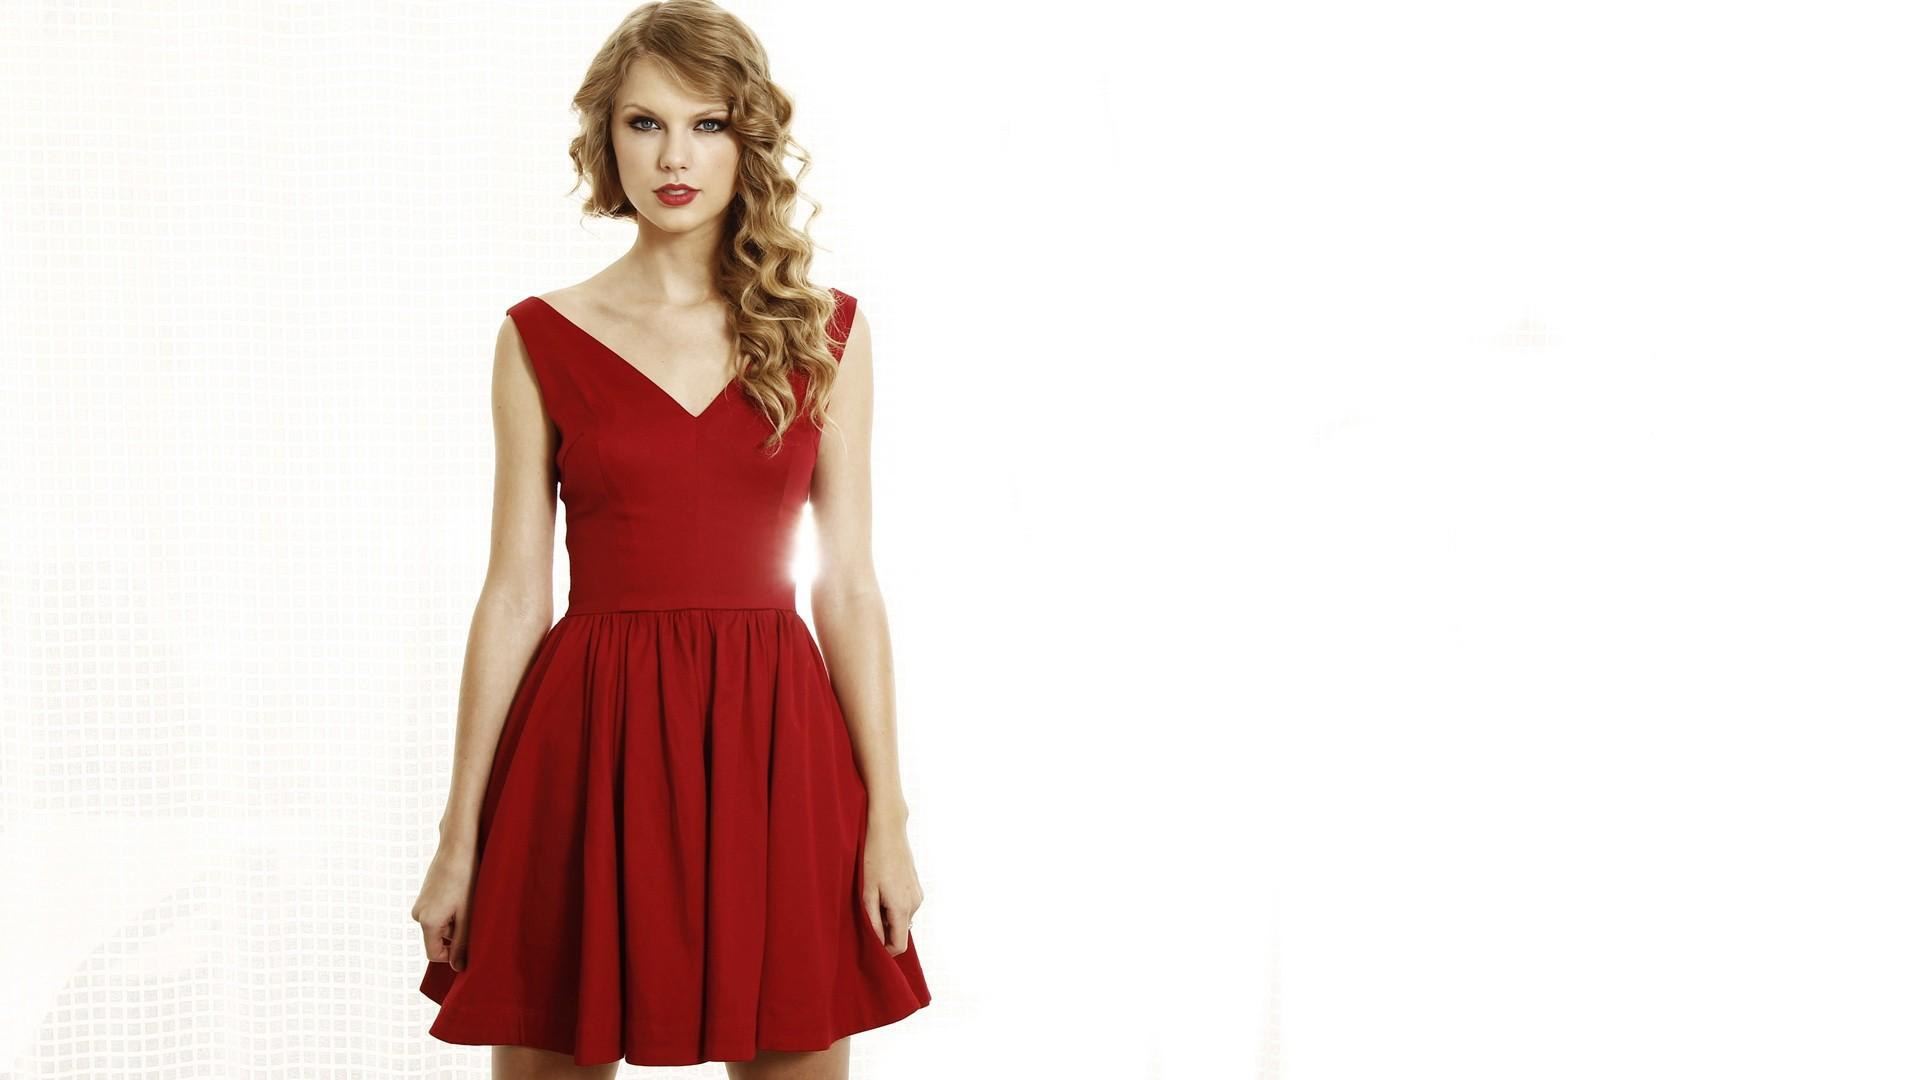 Hintergrundbilder : Frau, blond, rot, Berühmtheit, Sänger, rotes ...